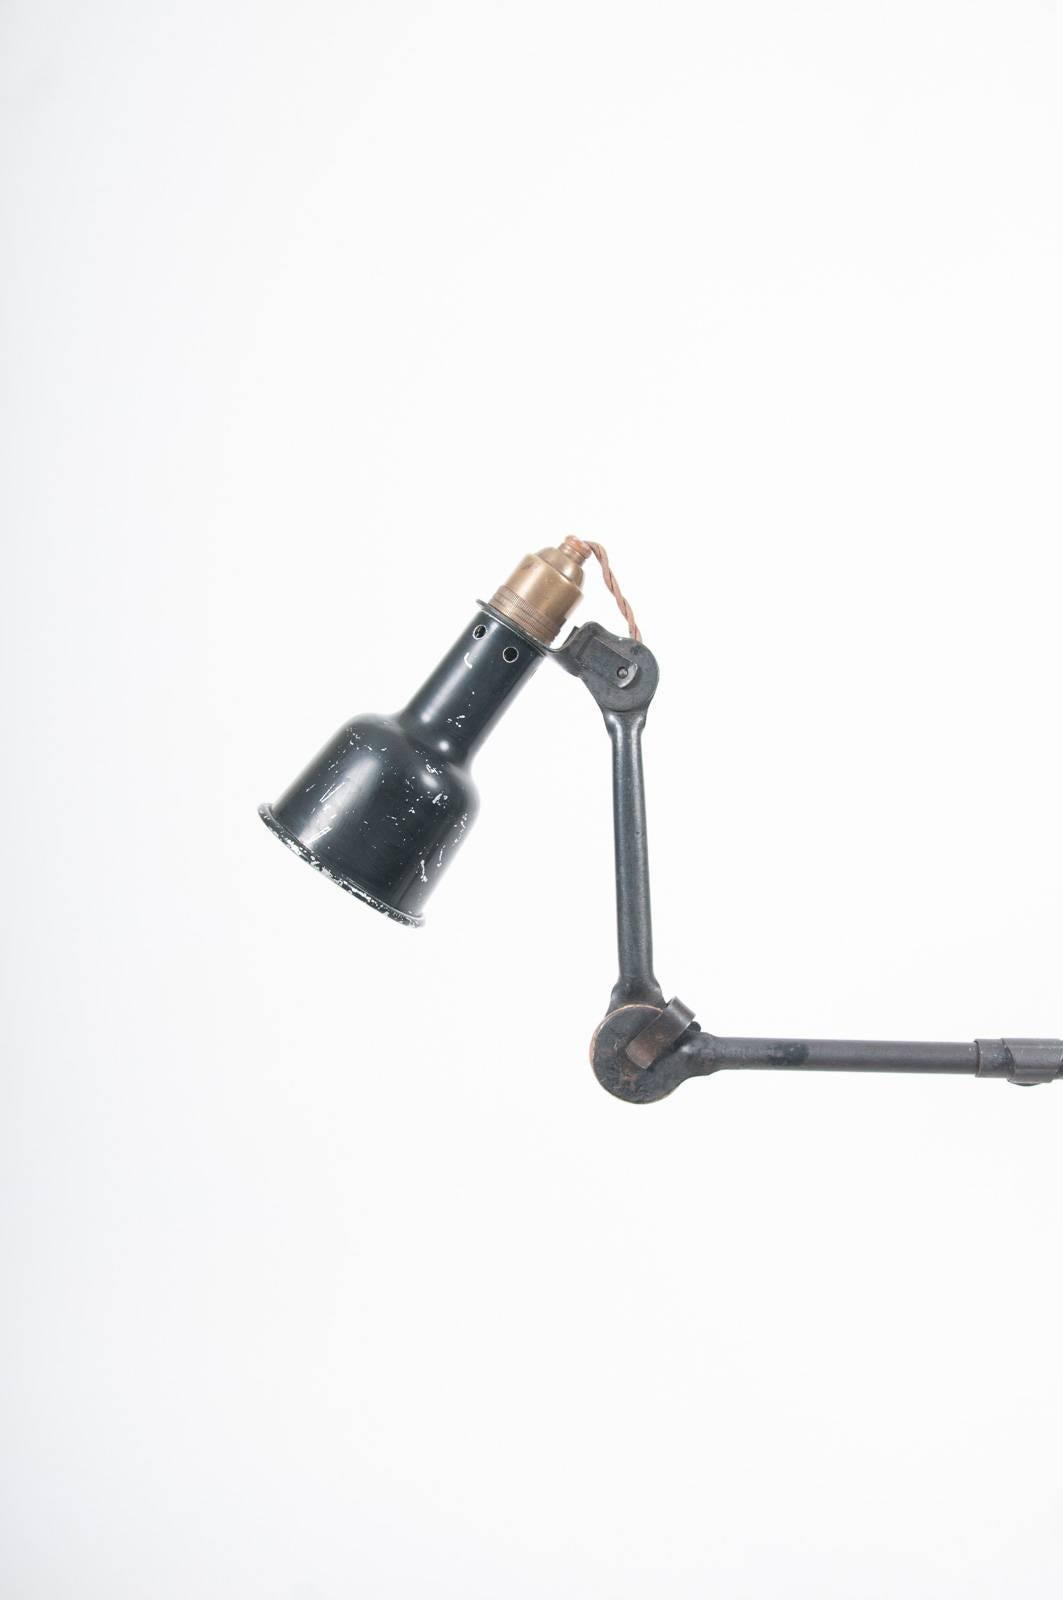 Gras ravel 403 model adjustable table lamp for sale at 1stdibs aloadofball Image collections